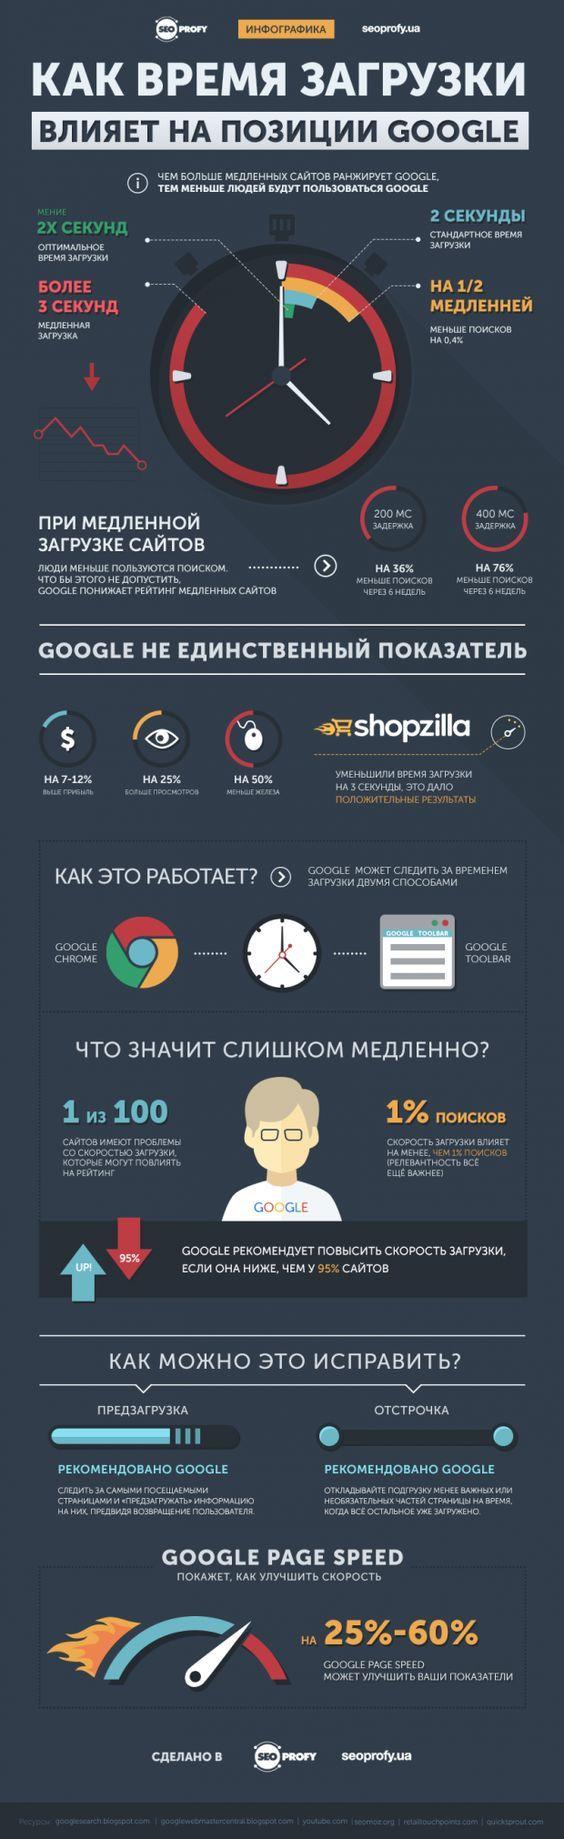 Как время загрузки влияет на позиции в Google – Инфографика от SeoProfy